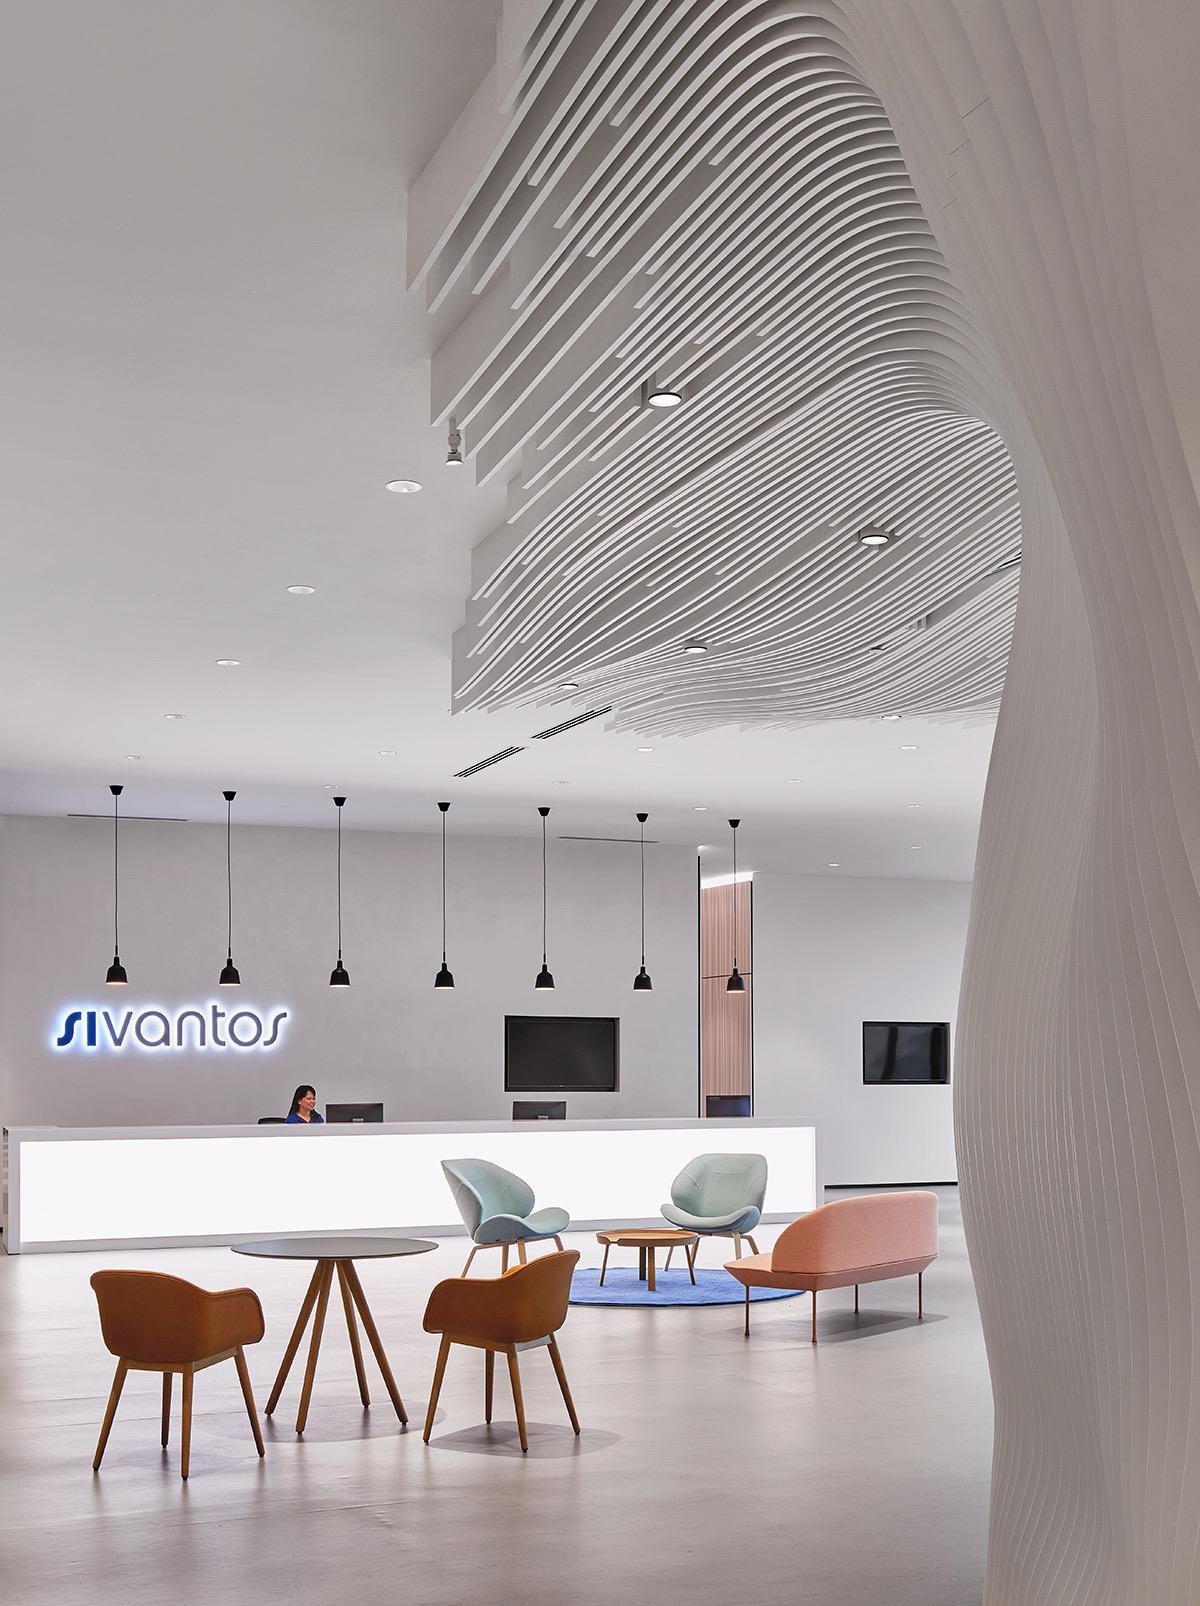 sivantos-office-singapore-3